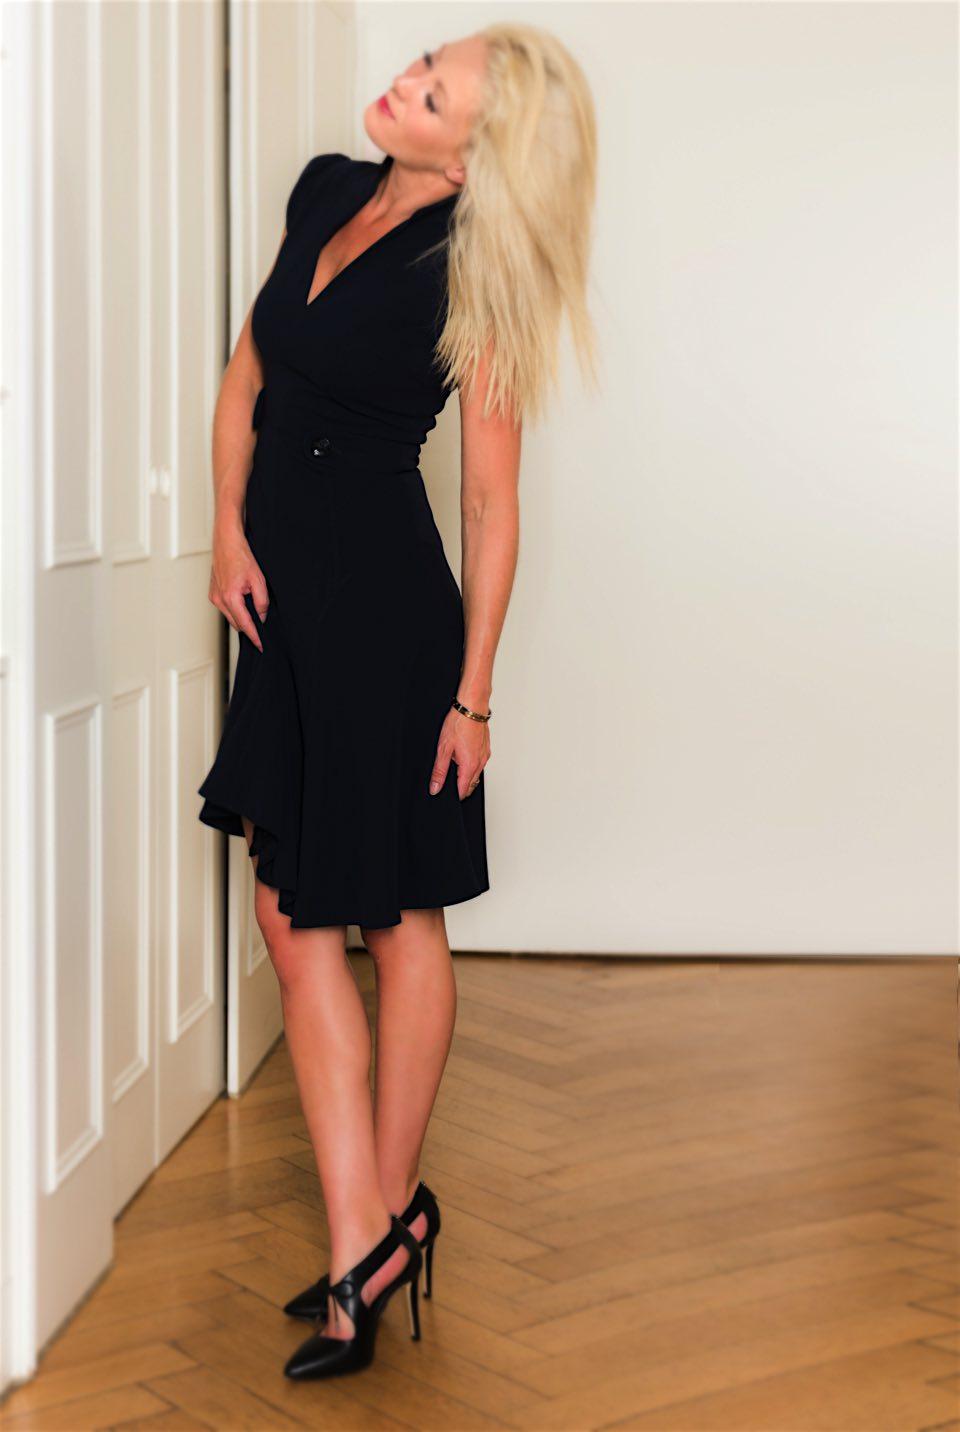 lady-jessy-perfect-date-escort-bester-service-in-berlin-deutschland-003.jpg